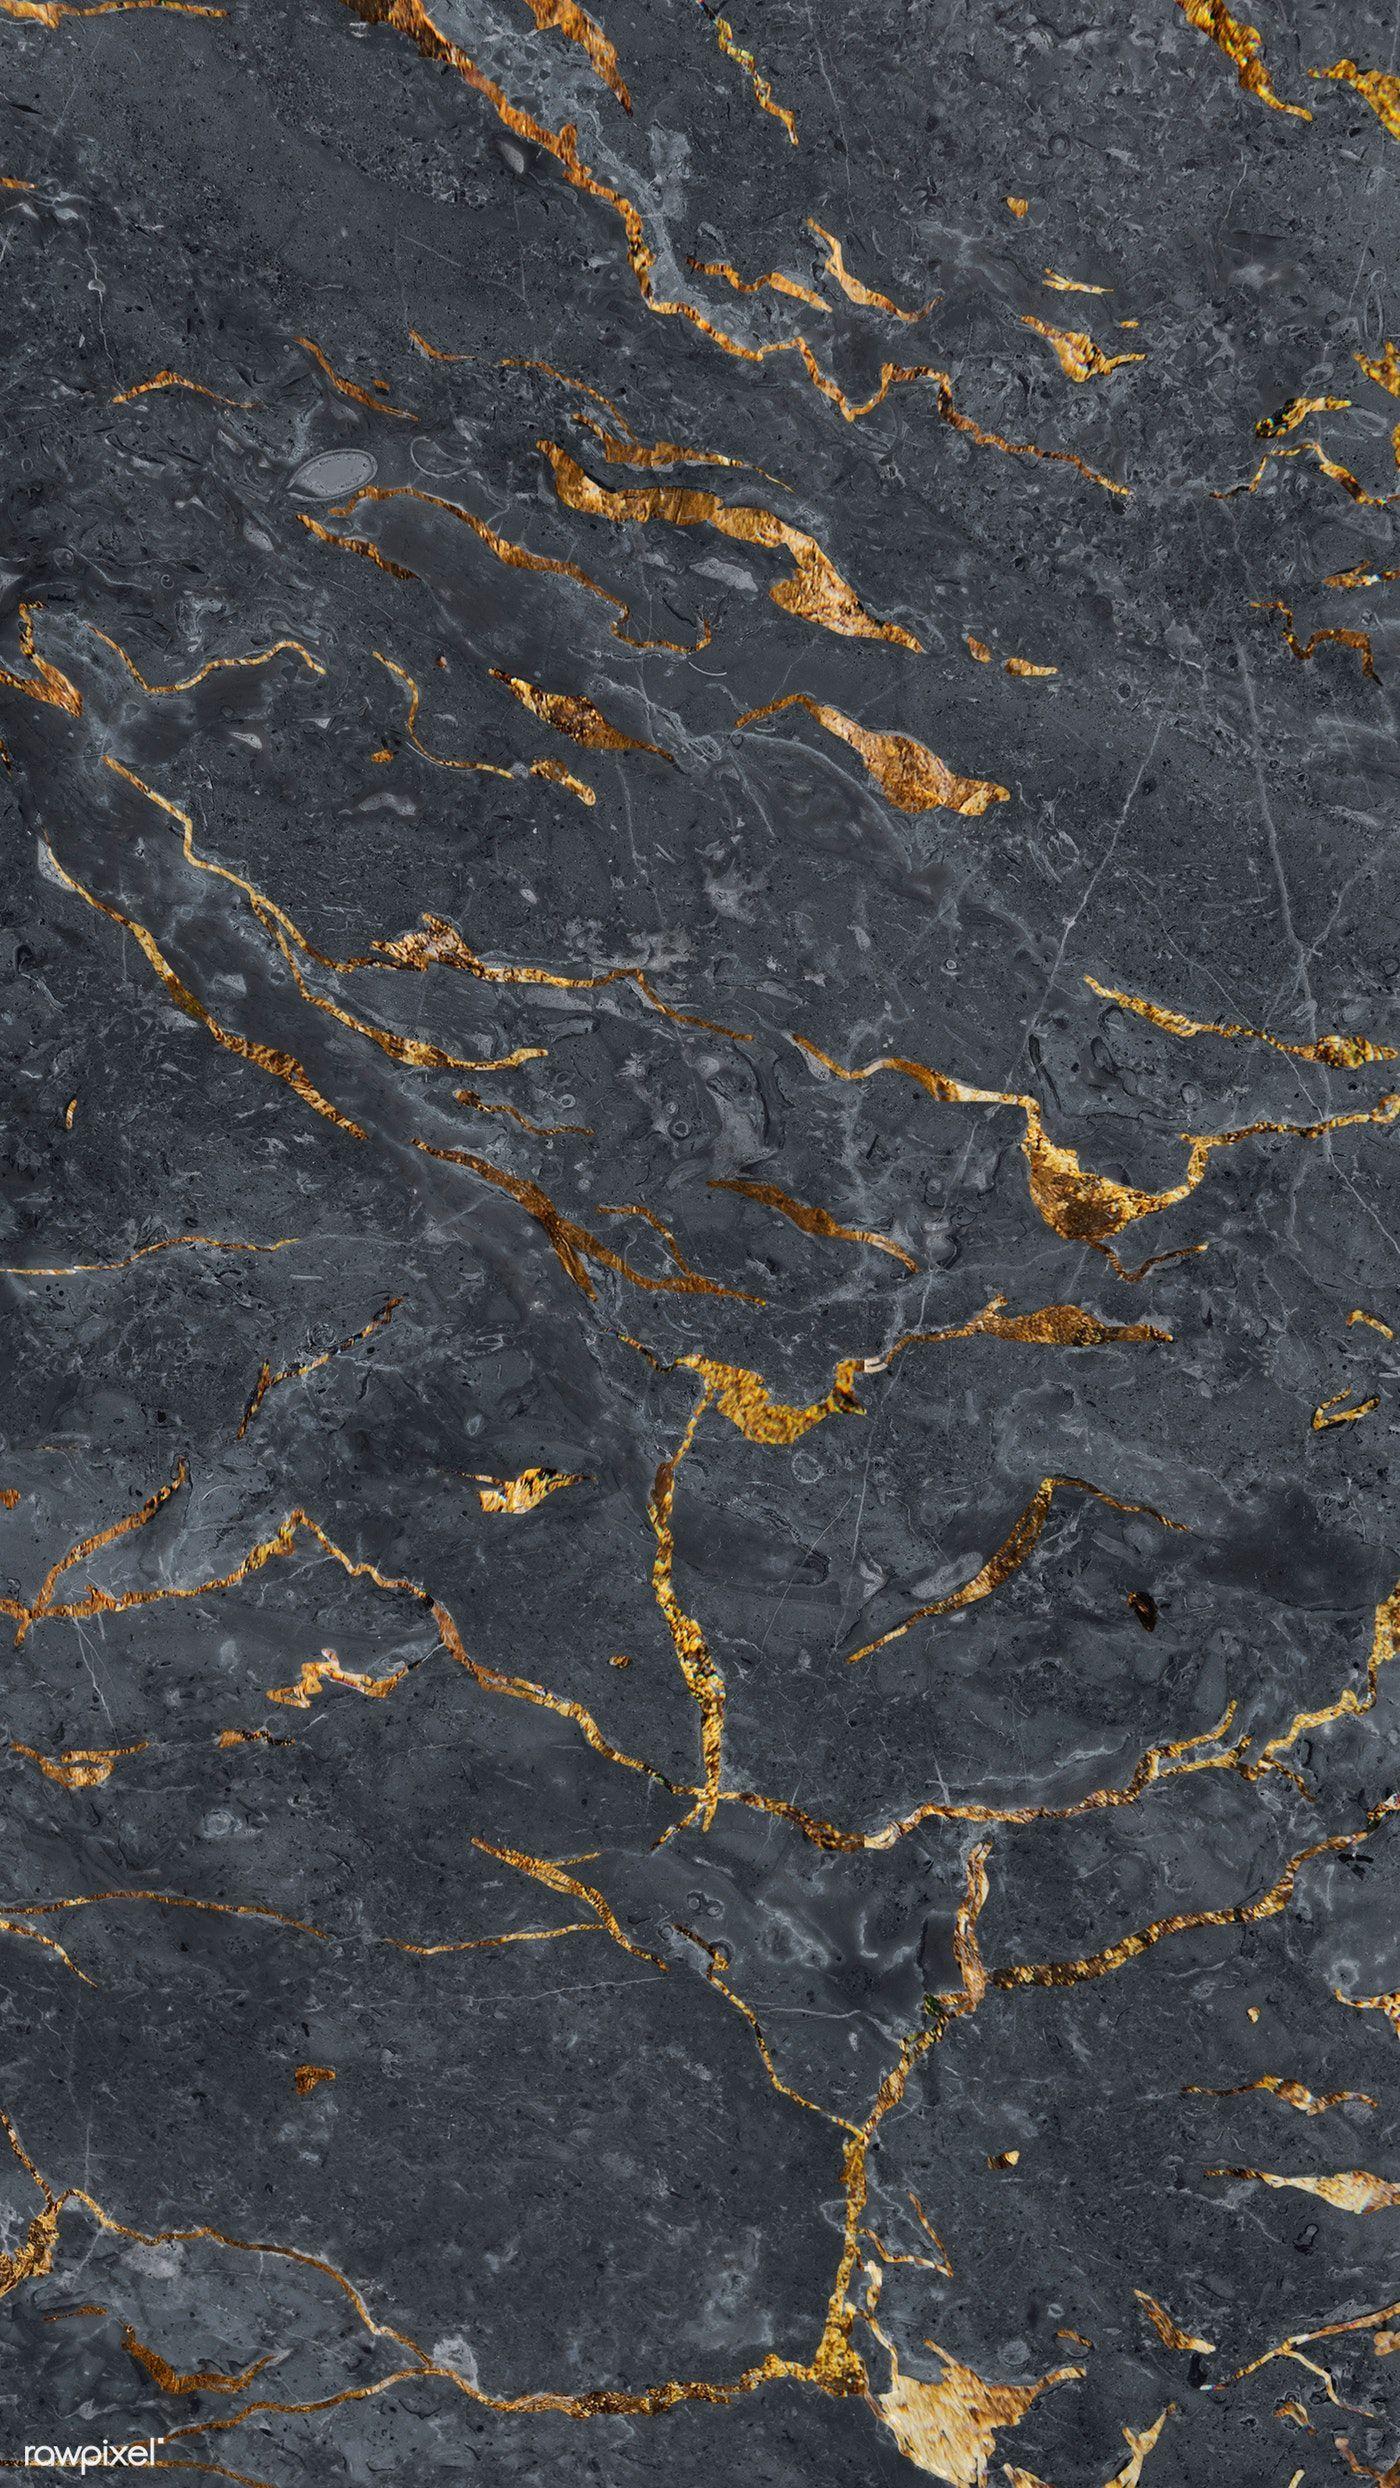 Gray marble textured mobile phone wallpaper premium